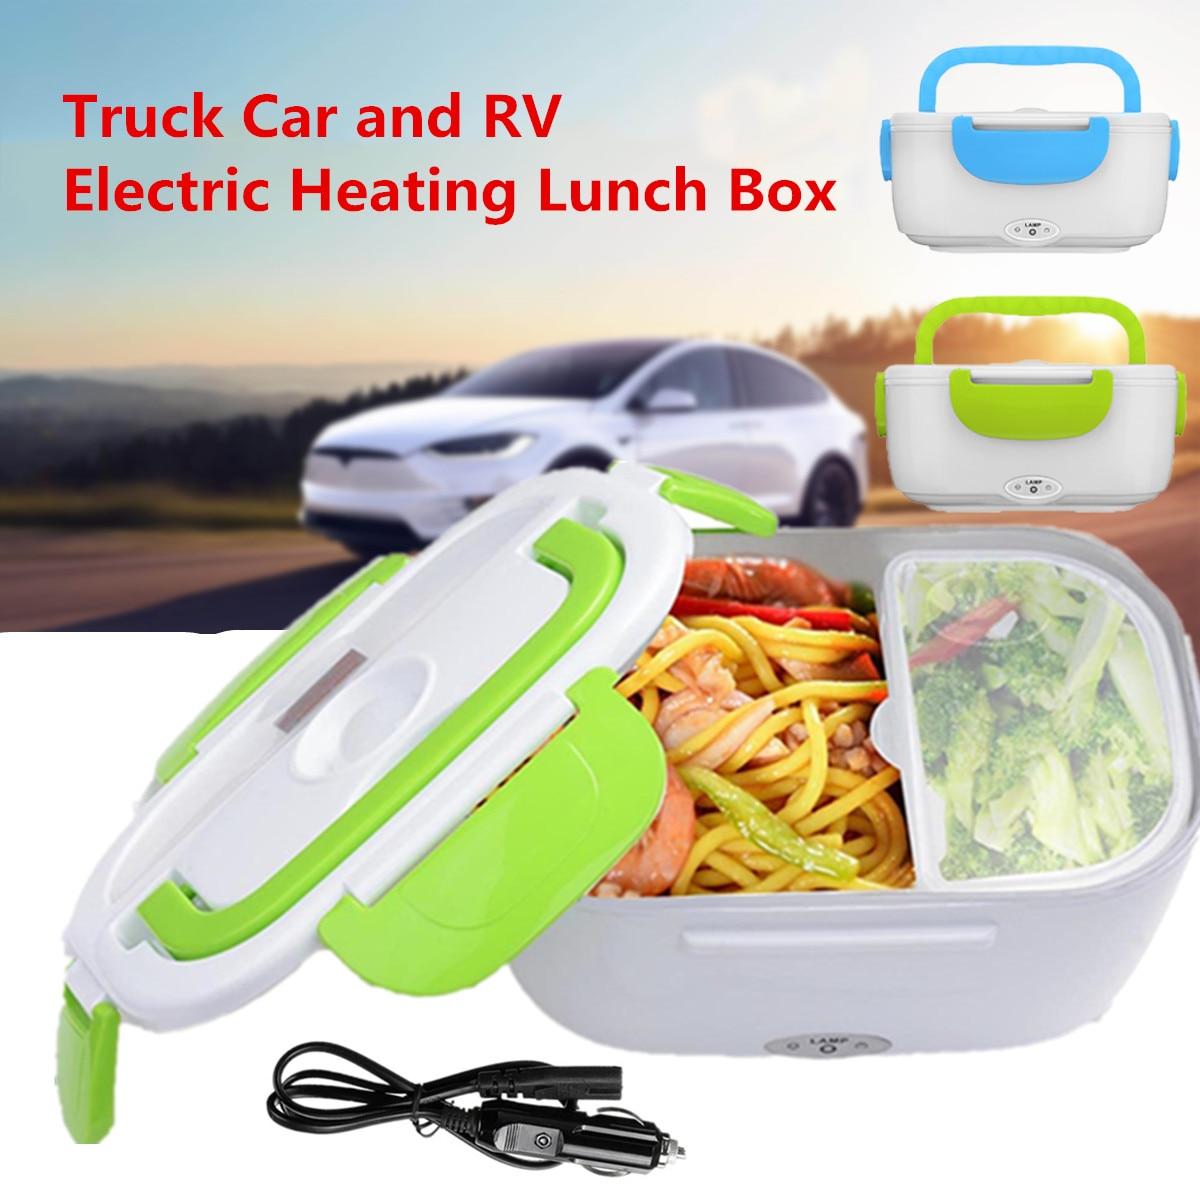 Fiambrera eléctrica portátil de 12-24V para coche, caja de comida Bento, contenedor de arroz, calentador para escuela, oficina, hogar, vajilla